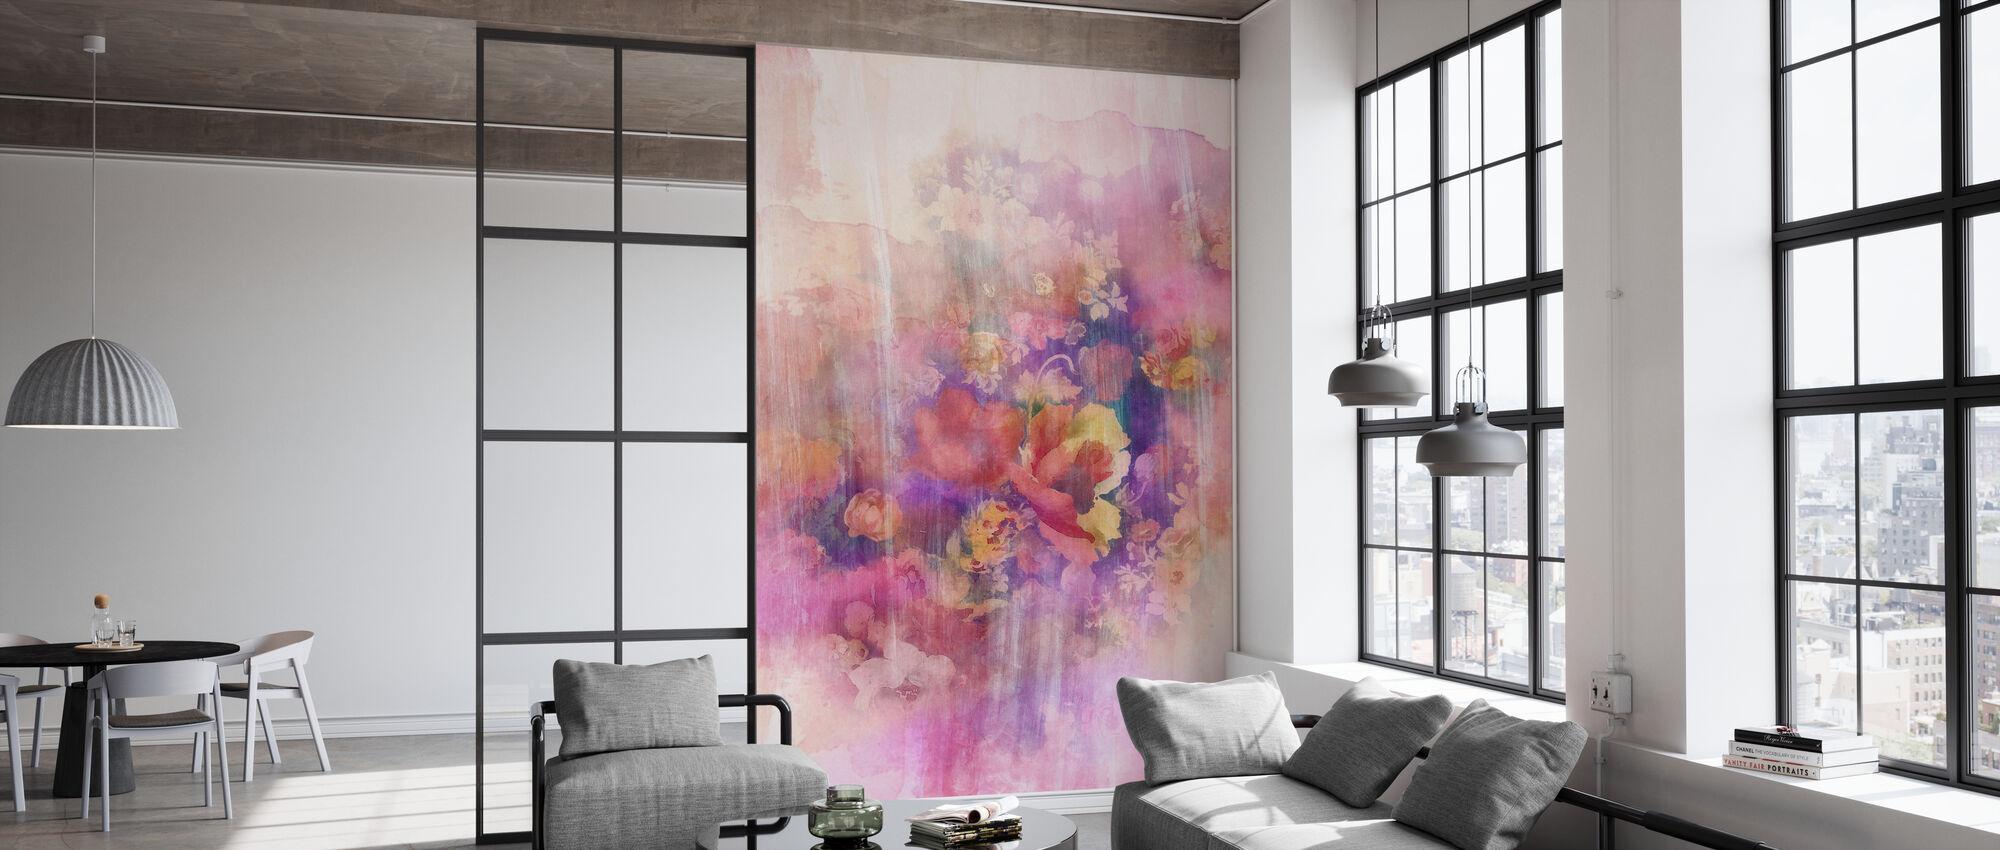 Smokey Floral April - Behang - Kantoor